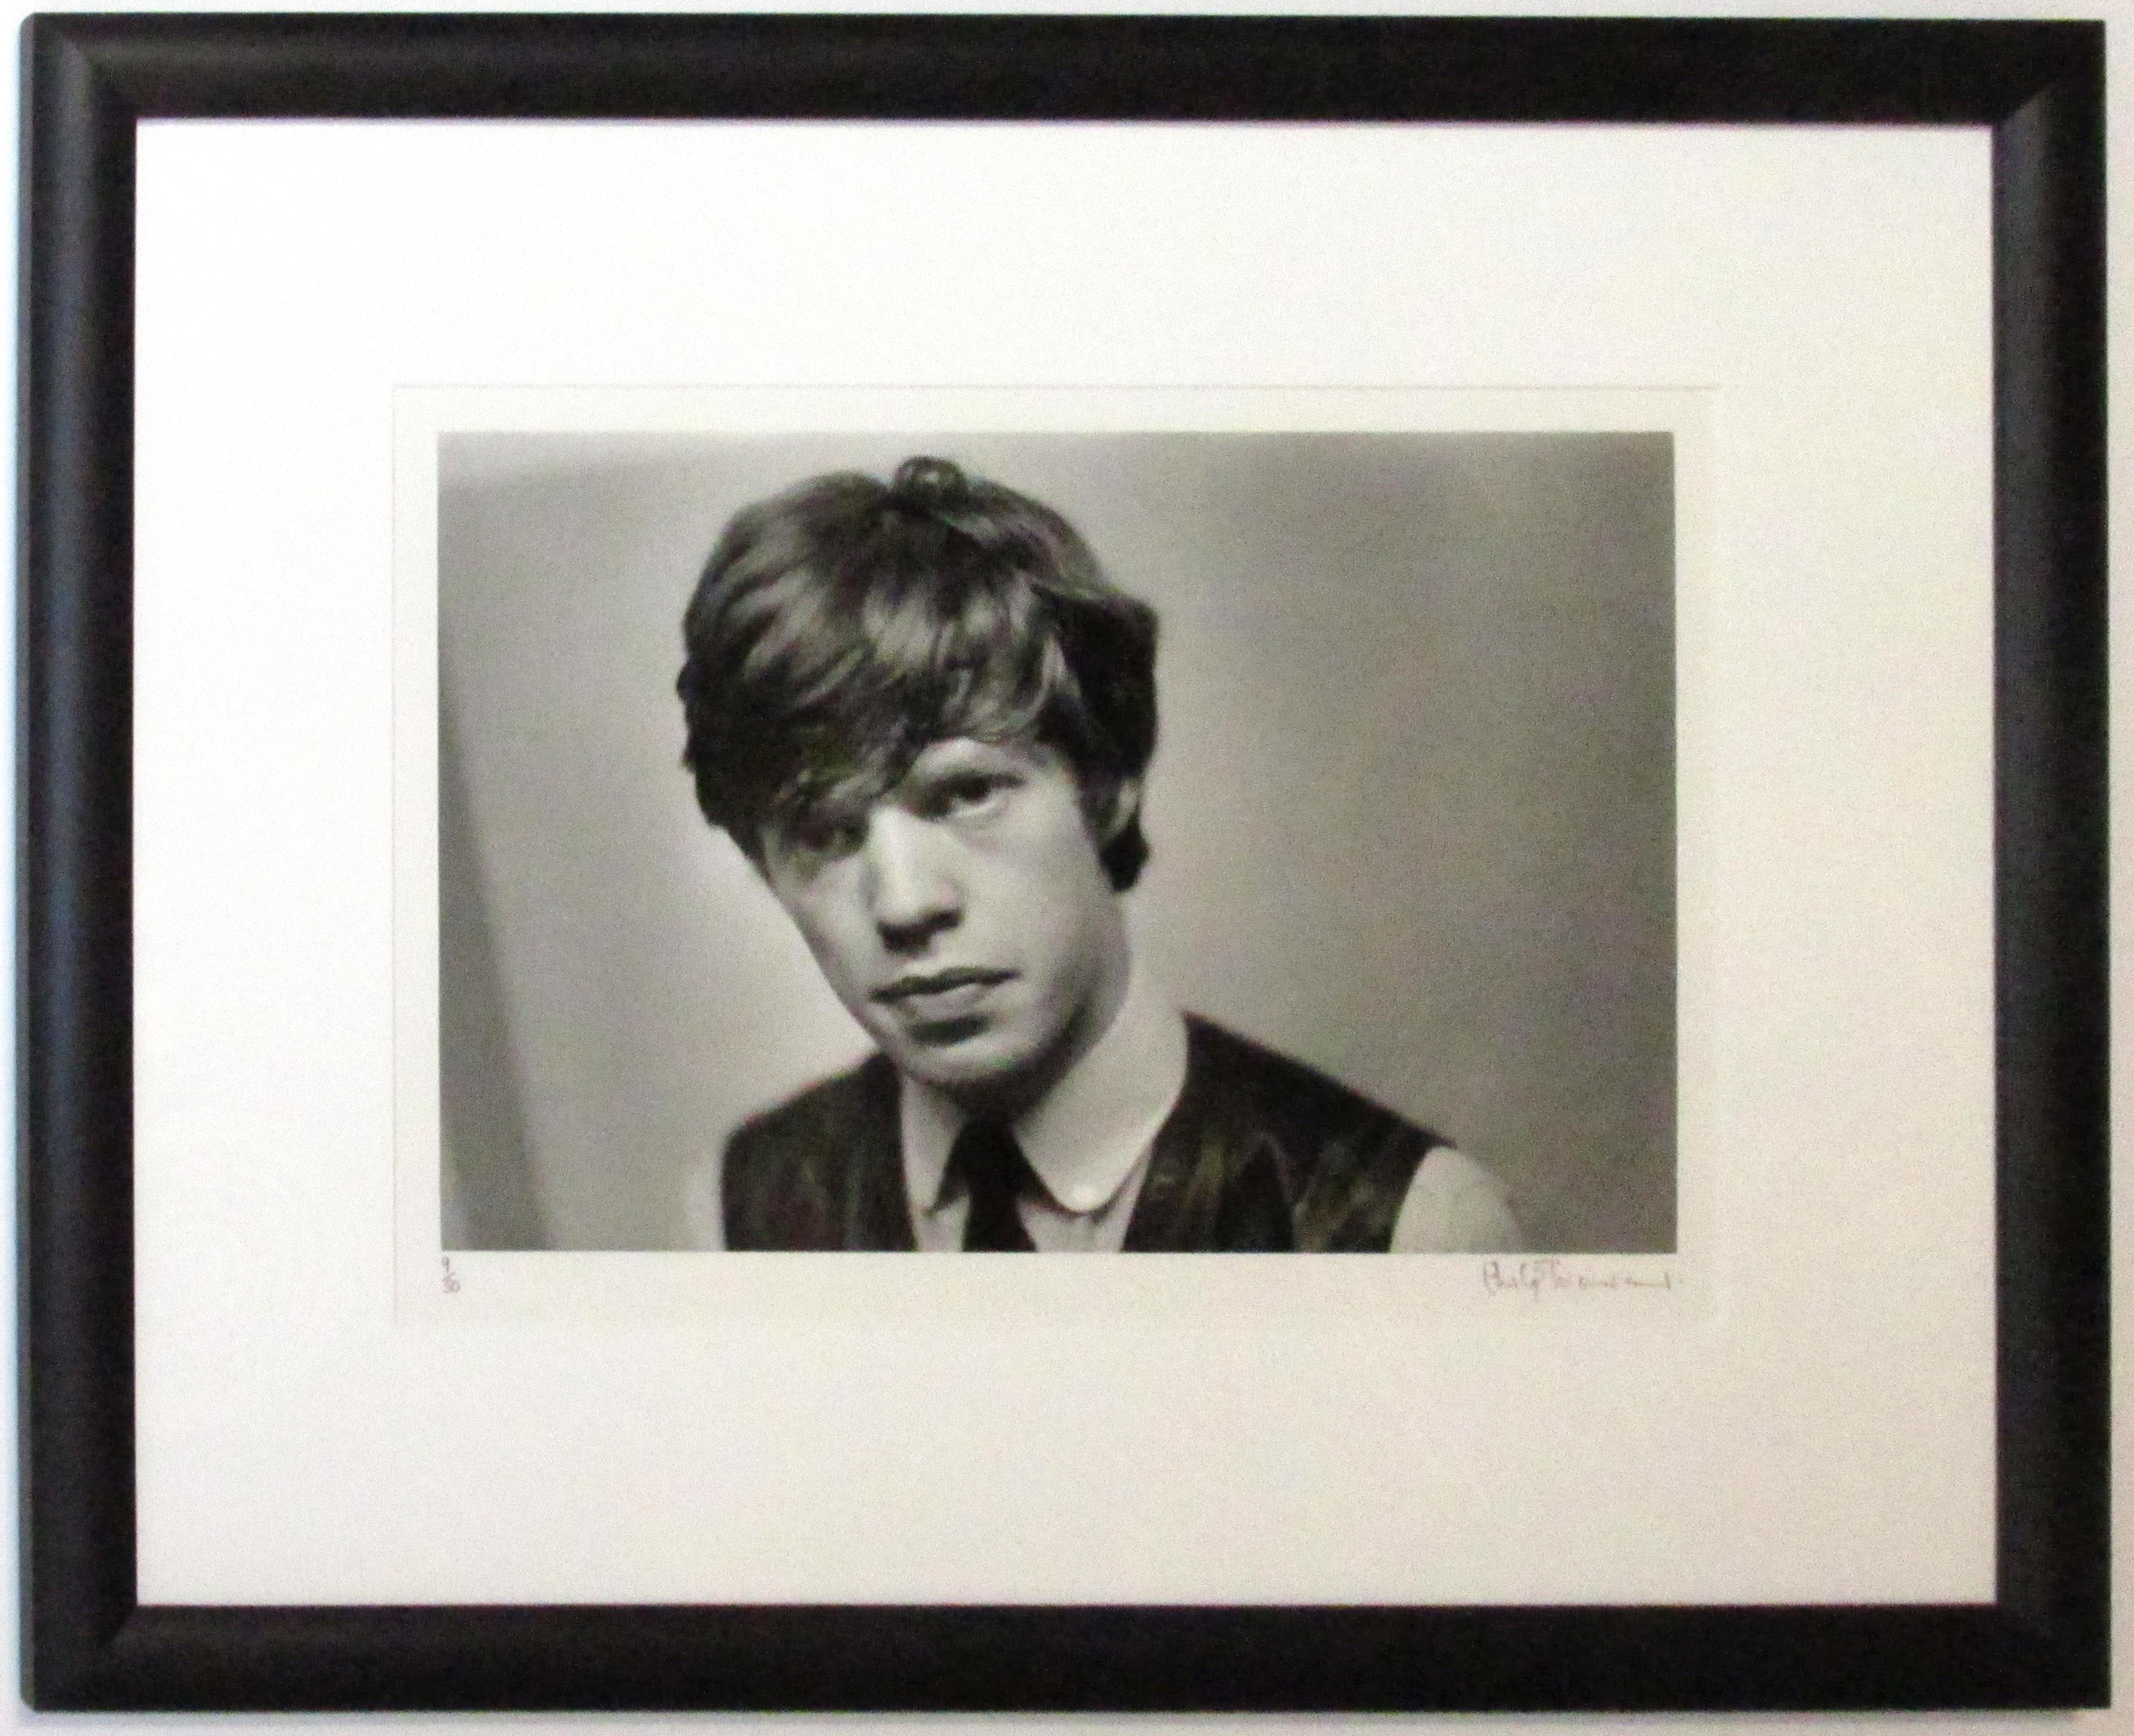 Rolling Stones - Mick in Vest (Framed) - IFF0009